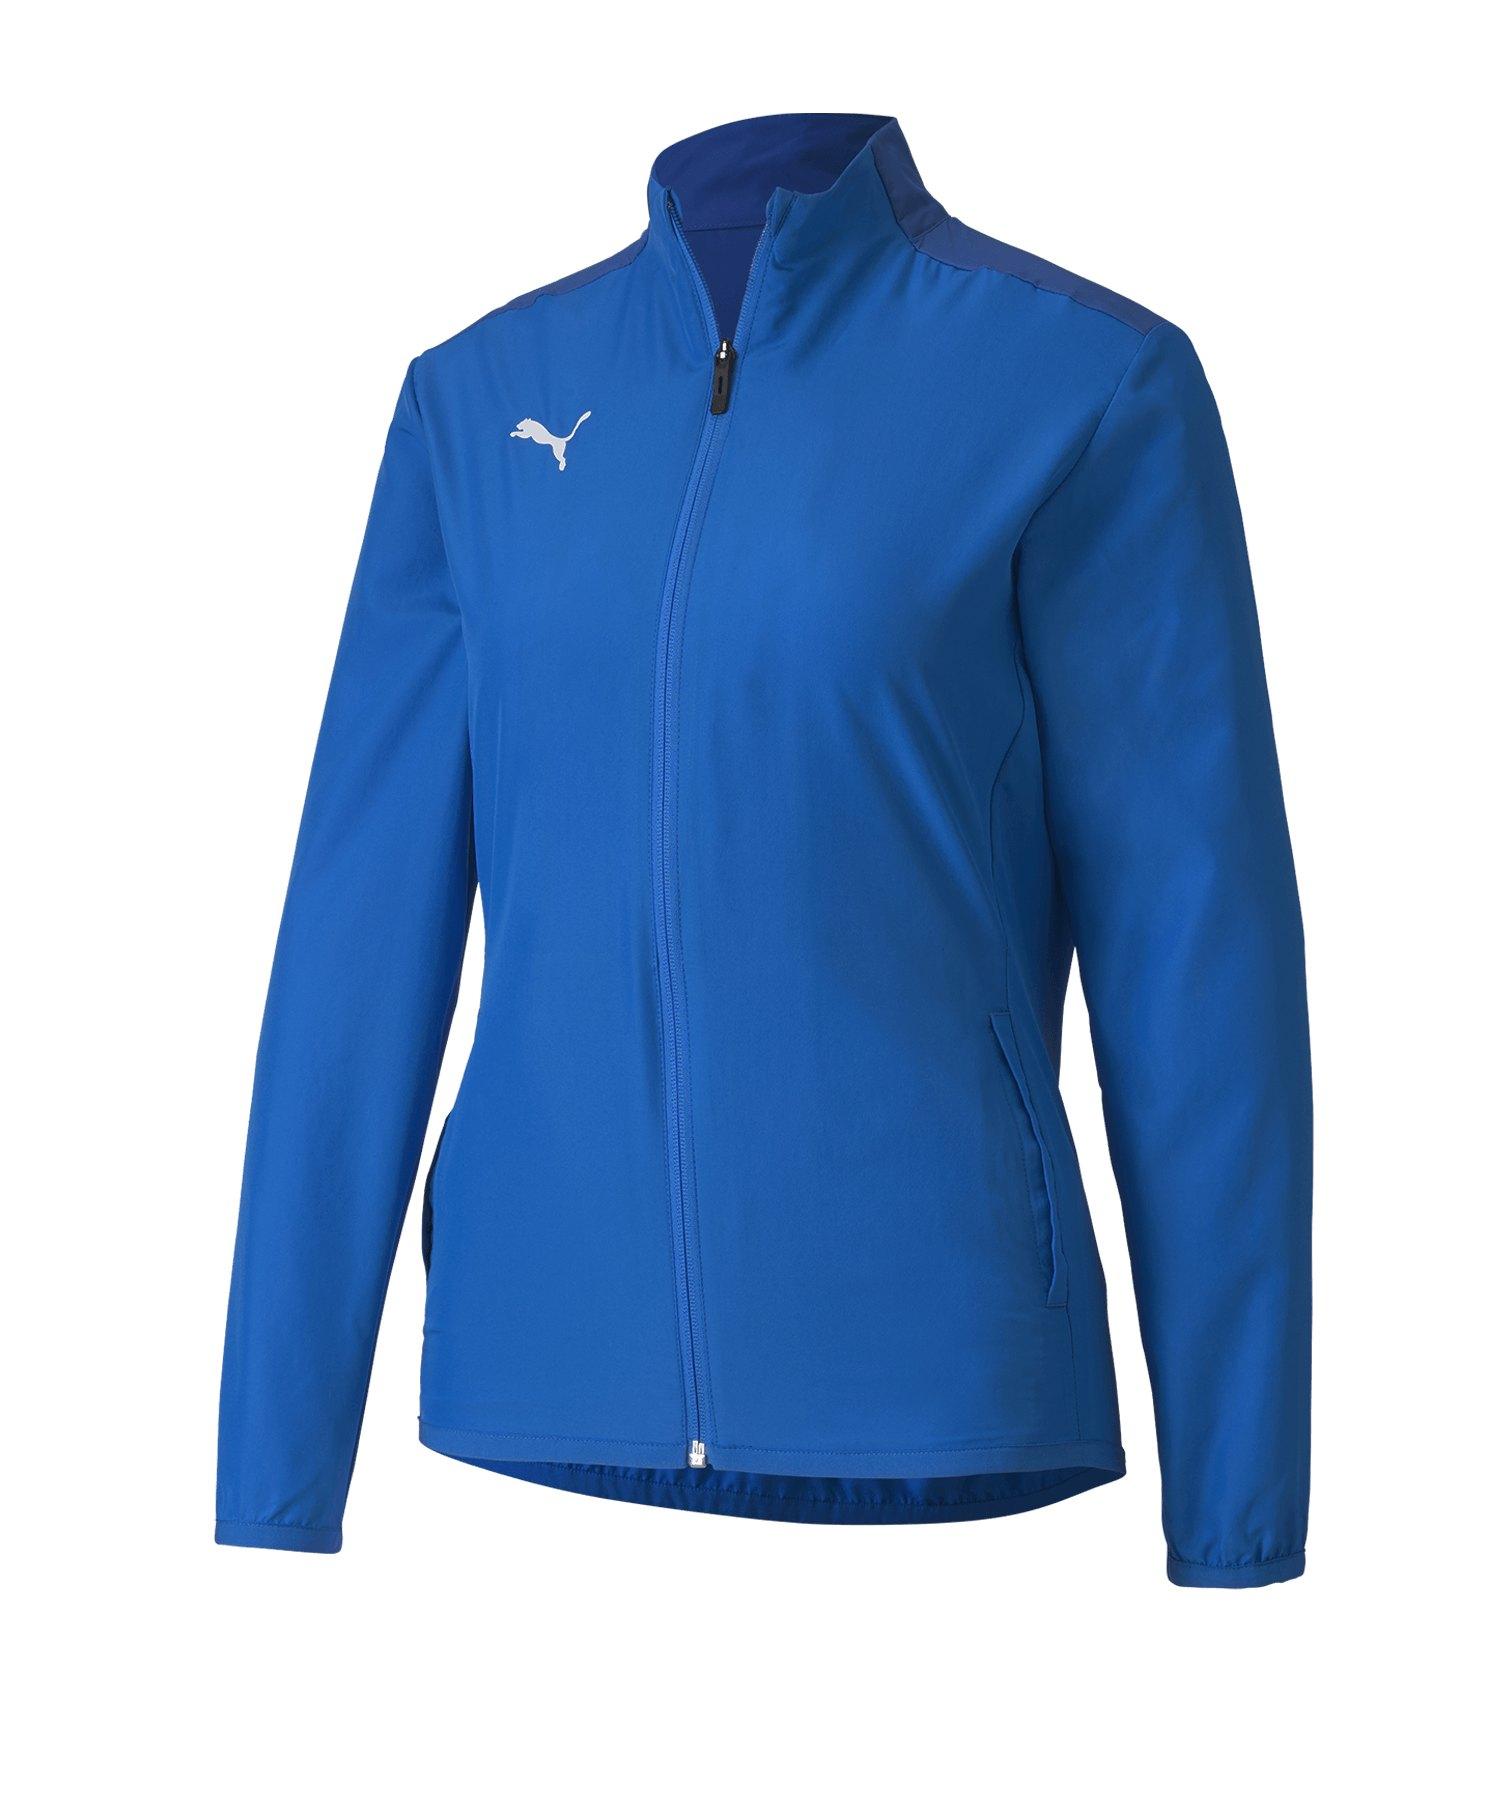 PUMA teamGOAL 23 Sideline Trainingsjacke Damen F02 - blau